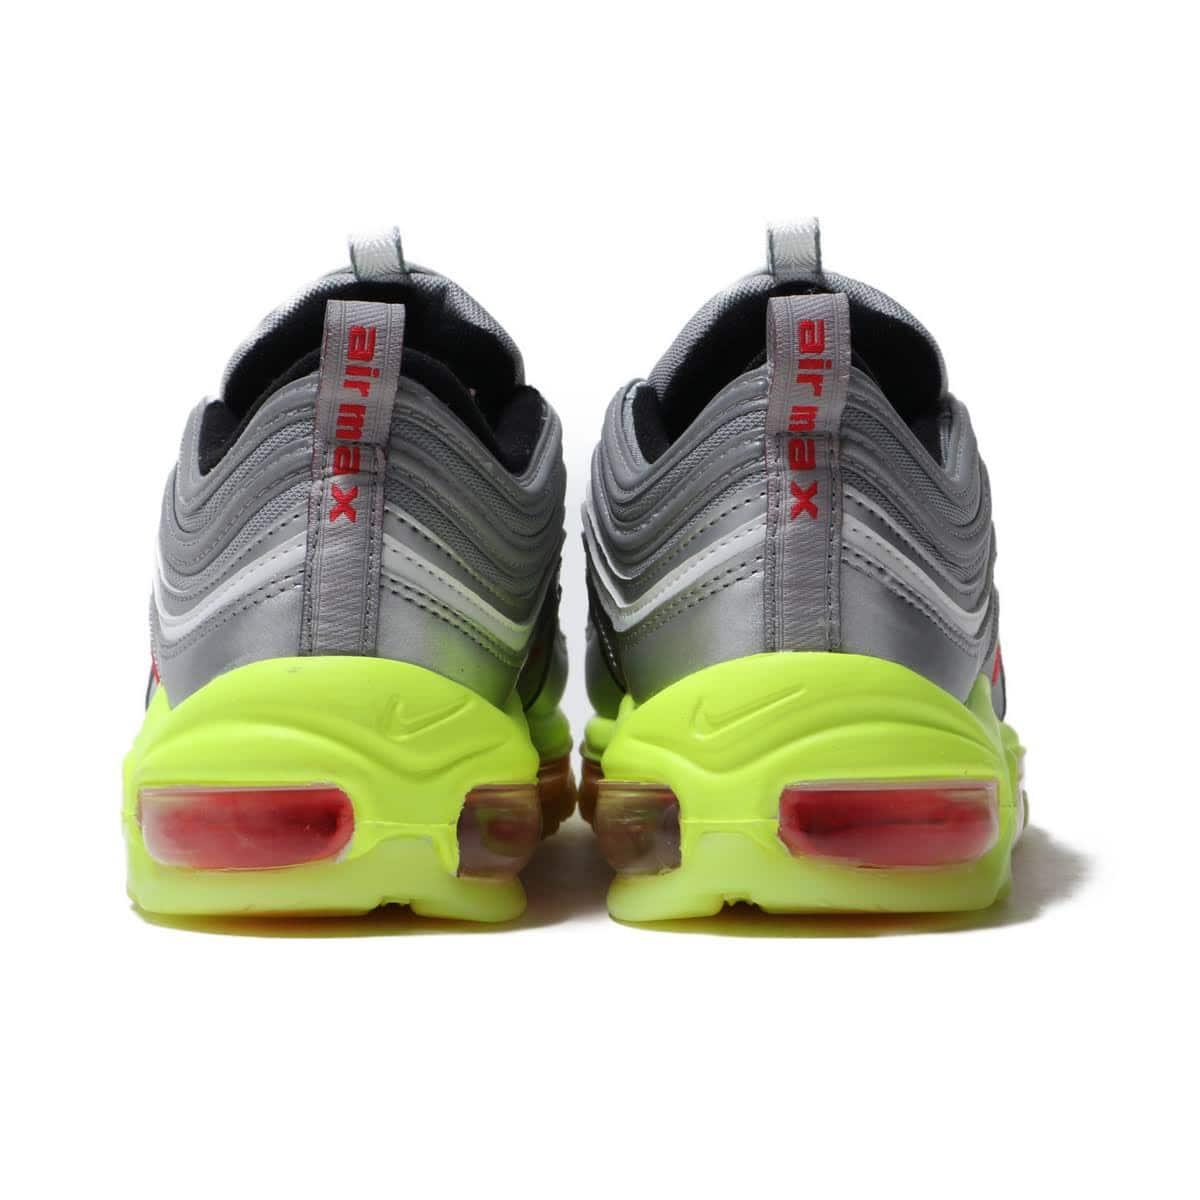 Nike Air Max 97 Silver Red Volt BQ8437 002 Release Date 2